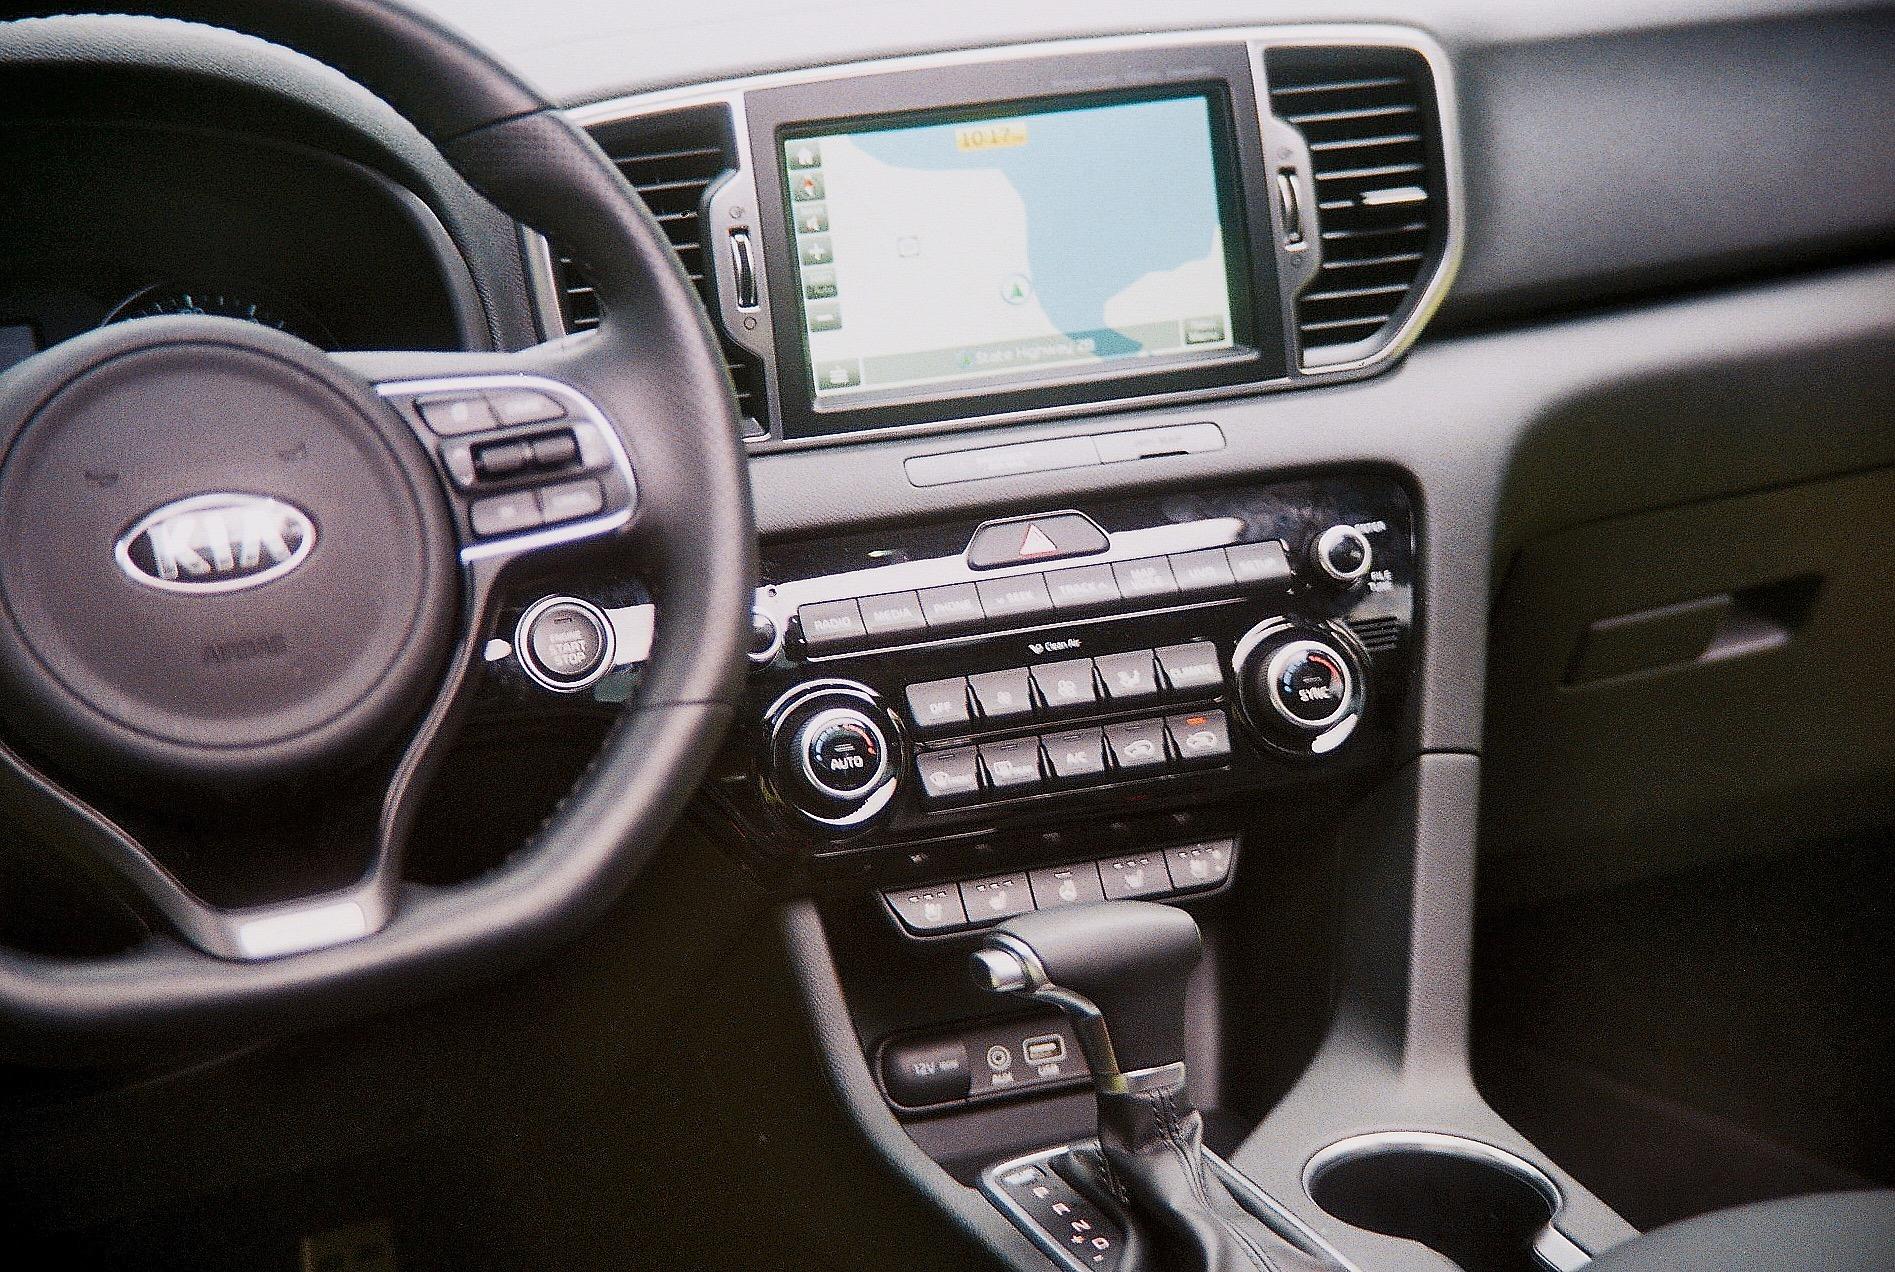 2017 Kia Sportage SX interior